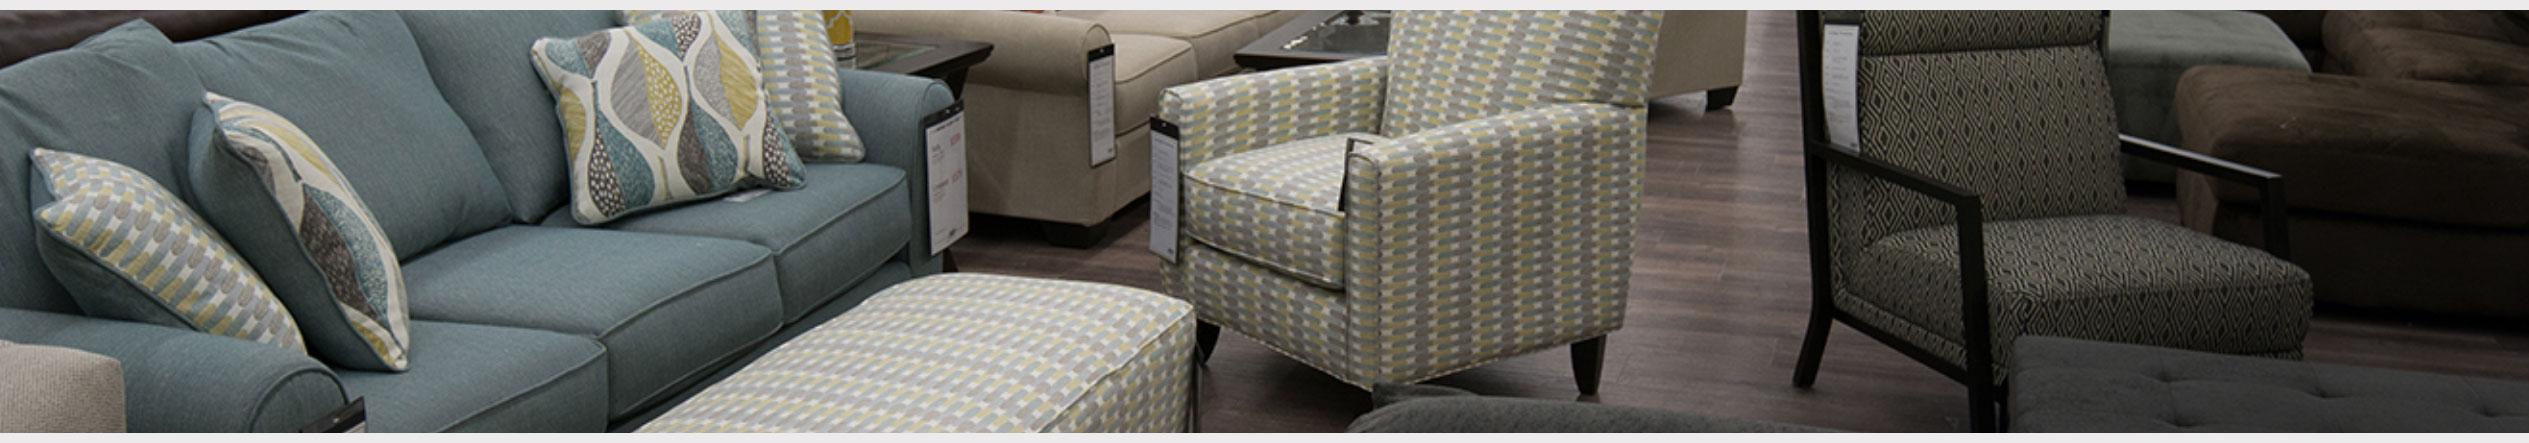 Furniture Factory Outlet Policies at Jordan's